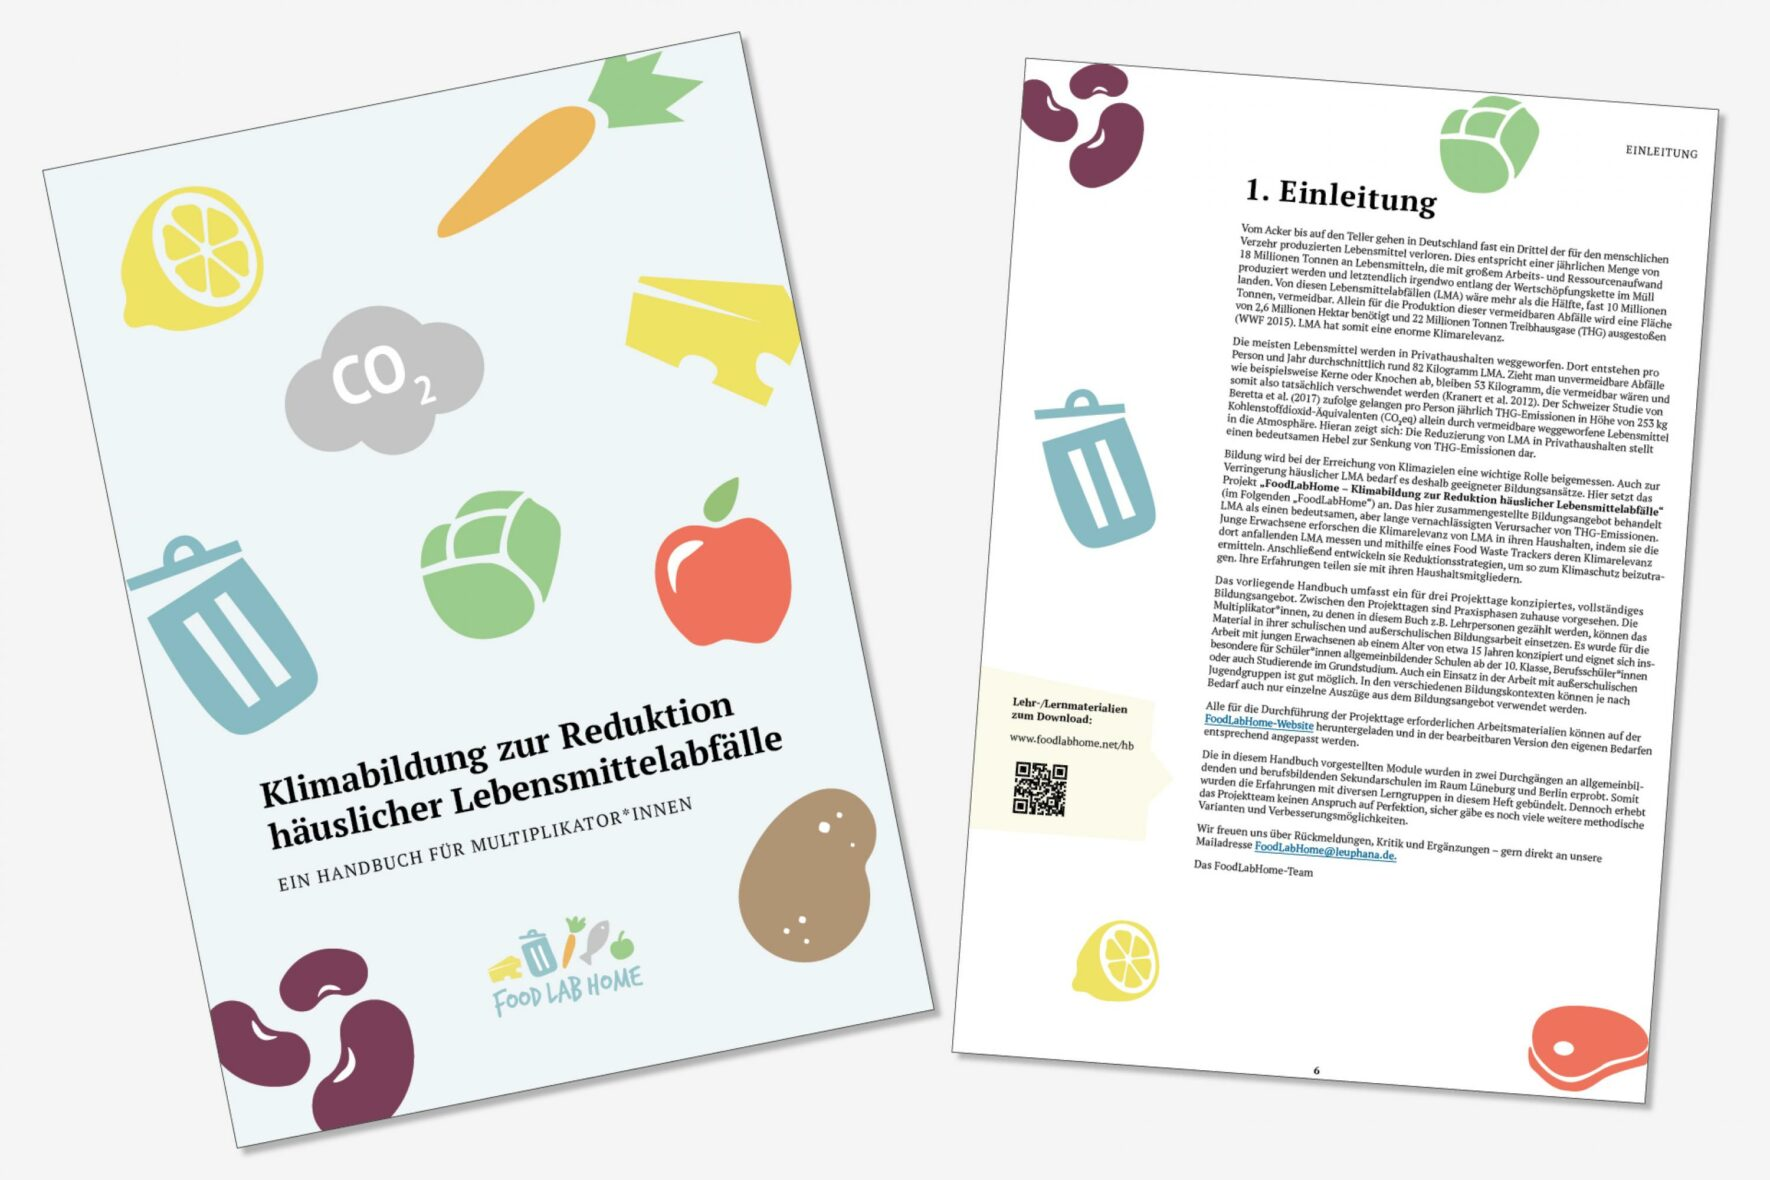 Klimarechner-Icons-FoodLabHome-Food-waste-tracker-FORMLOS-Berlin-Icons-Gestaltung-4